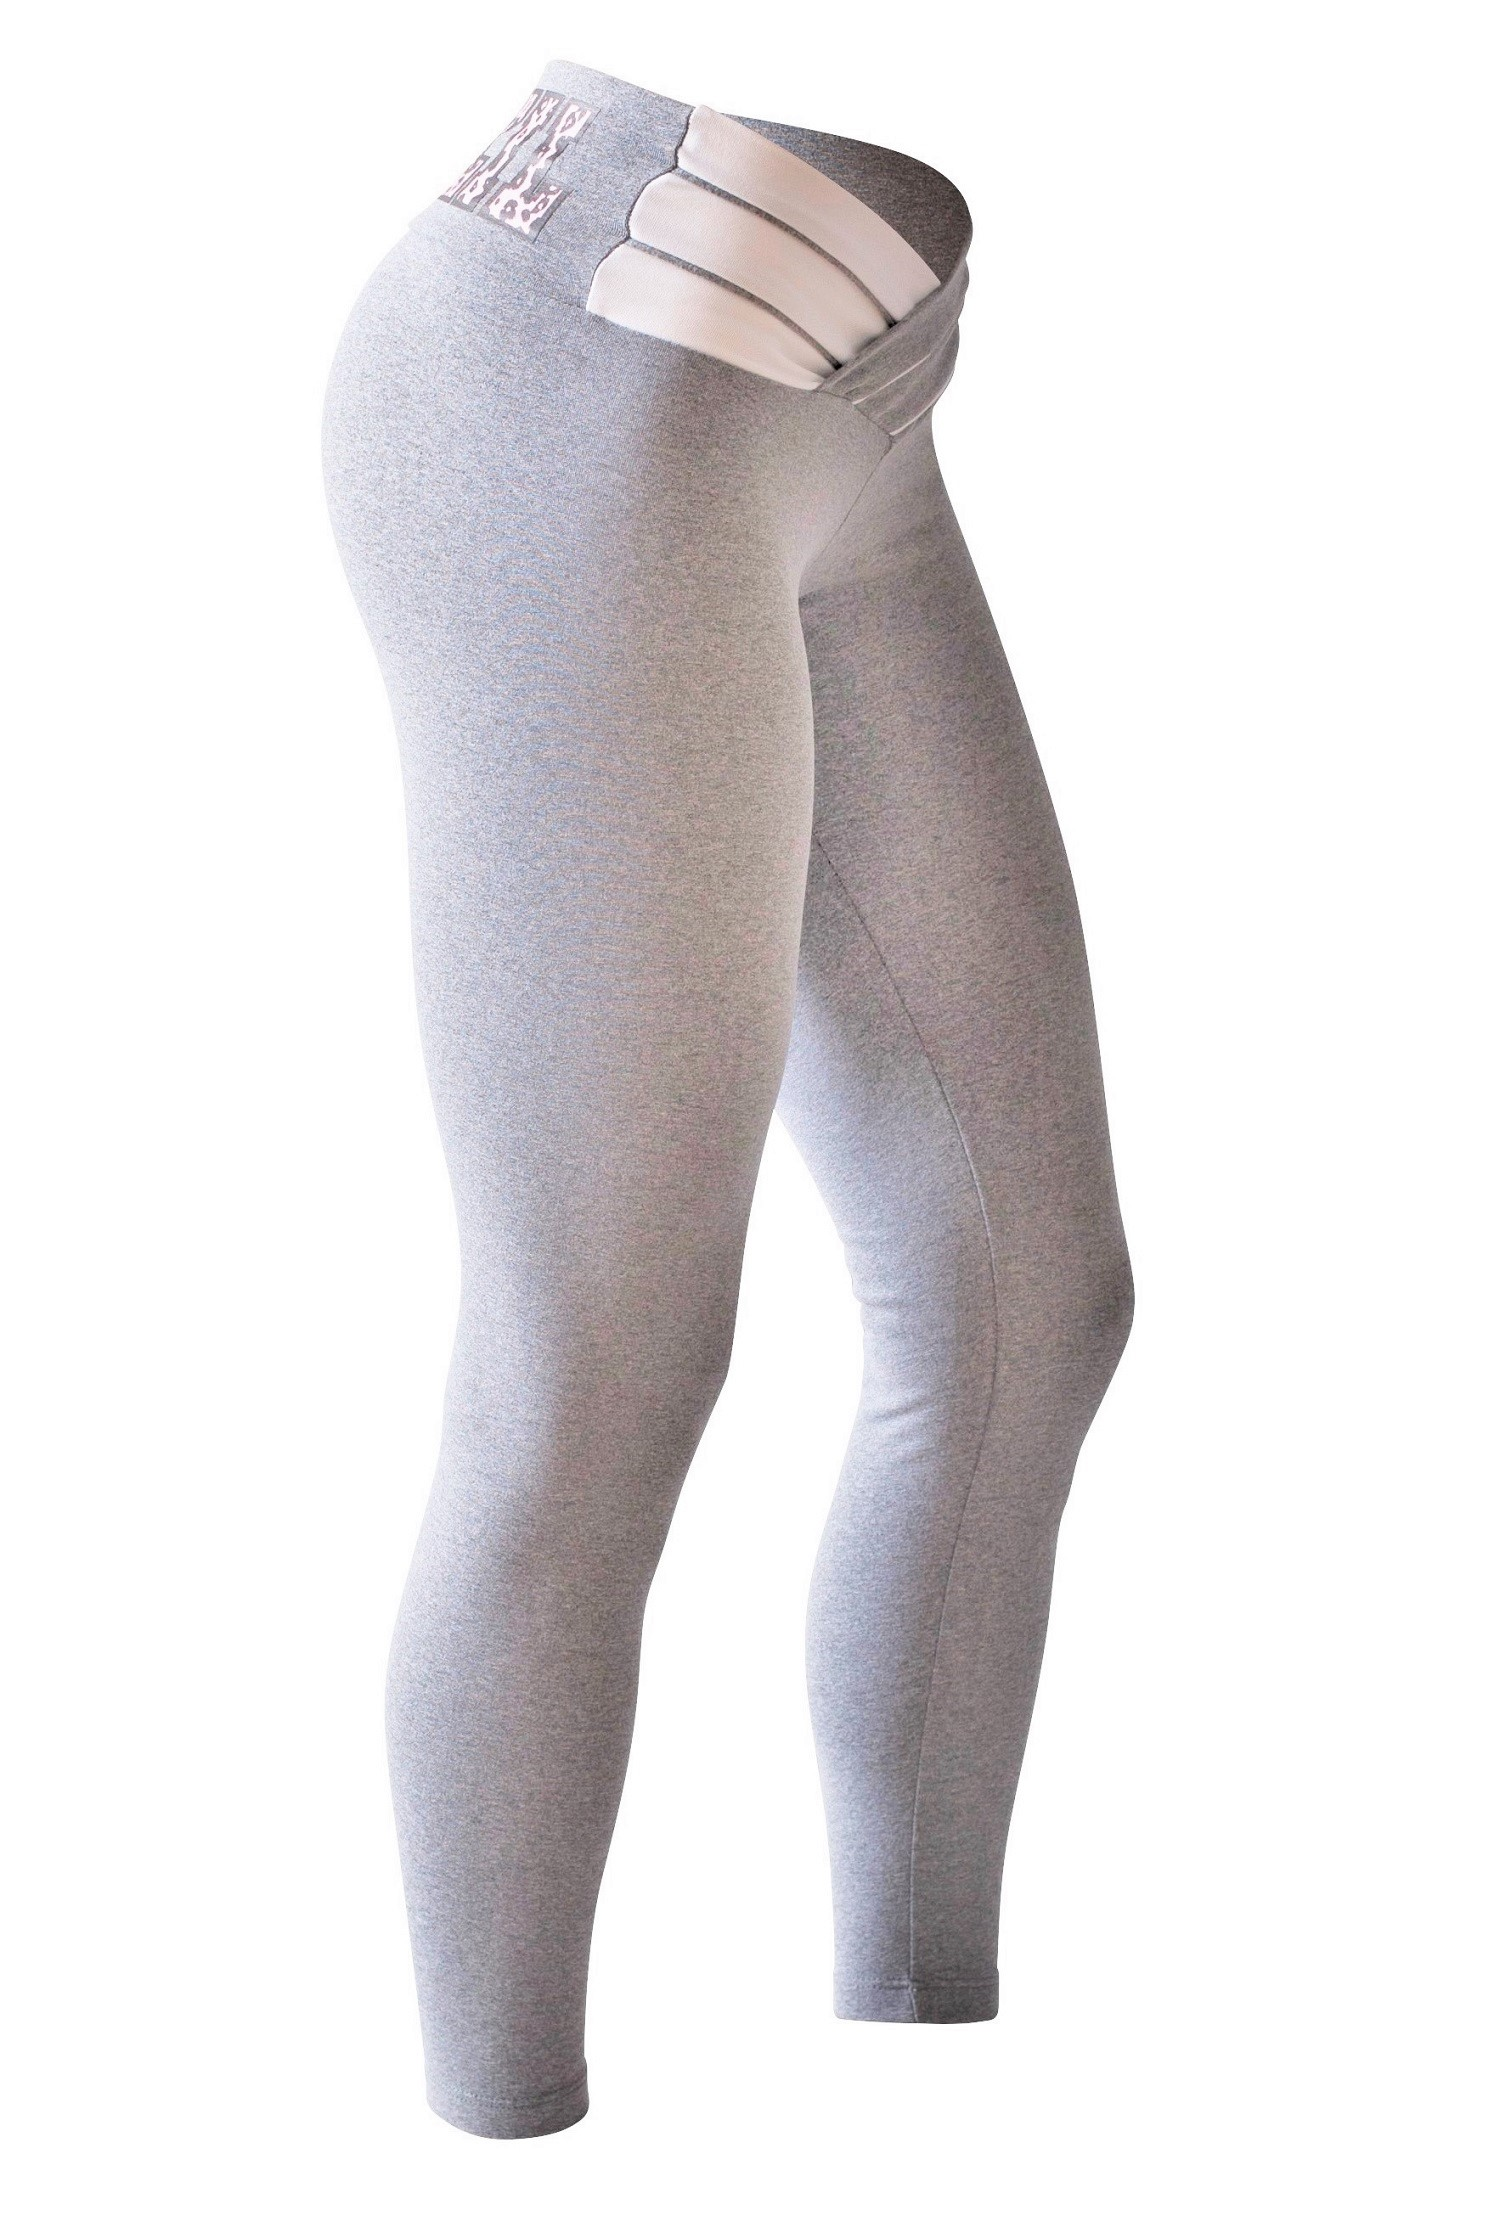 f5d394dd28501 Bia Brazil Leggings 3115 Light Grey/White. Click to enlarge image